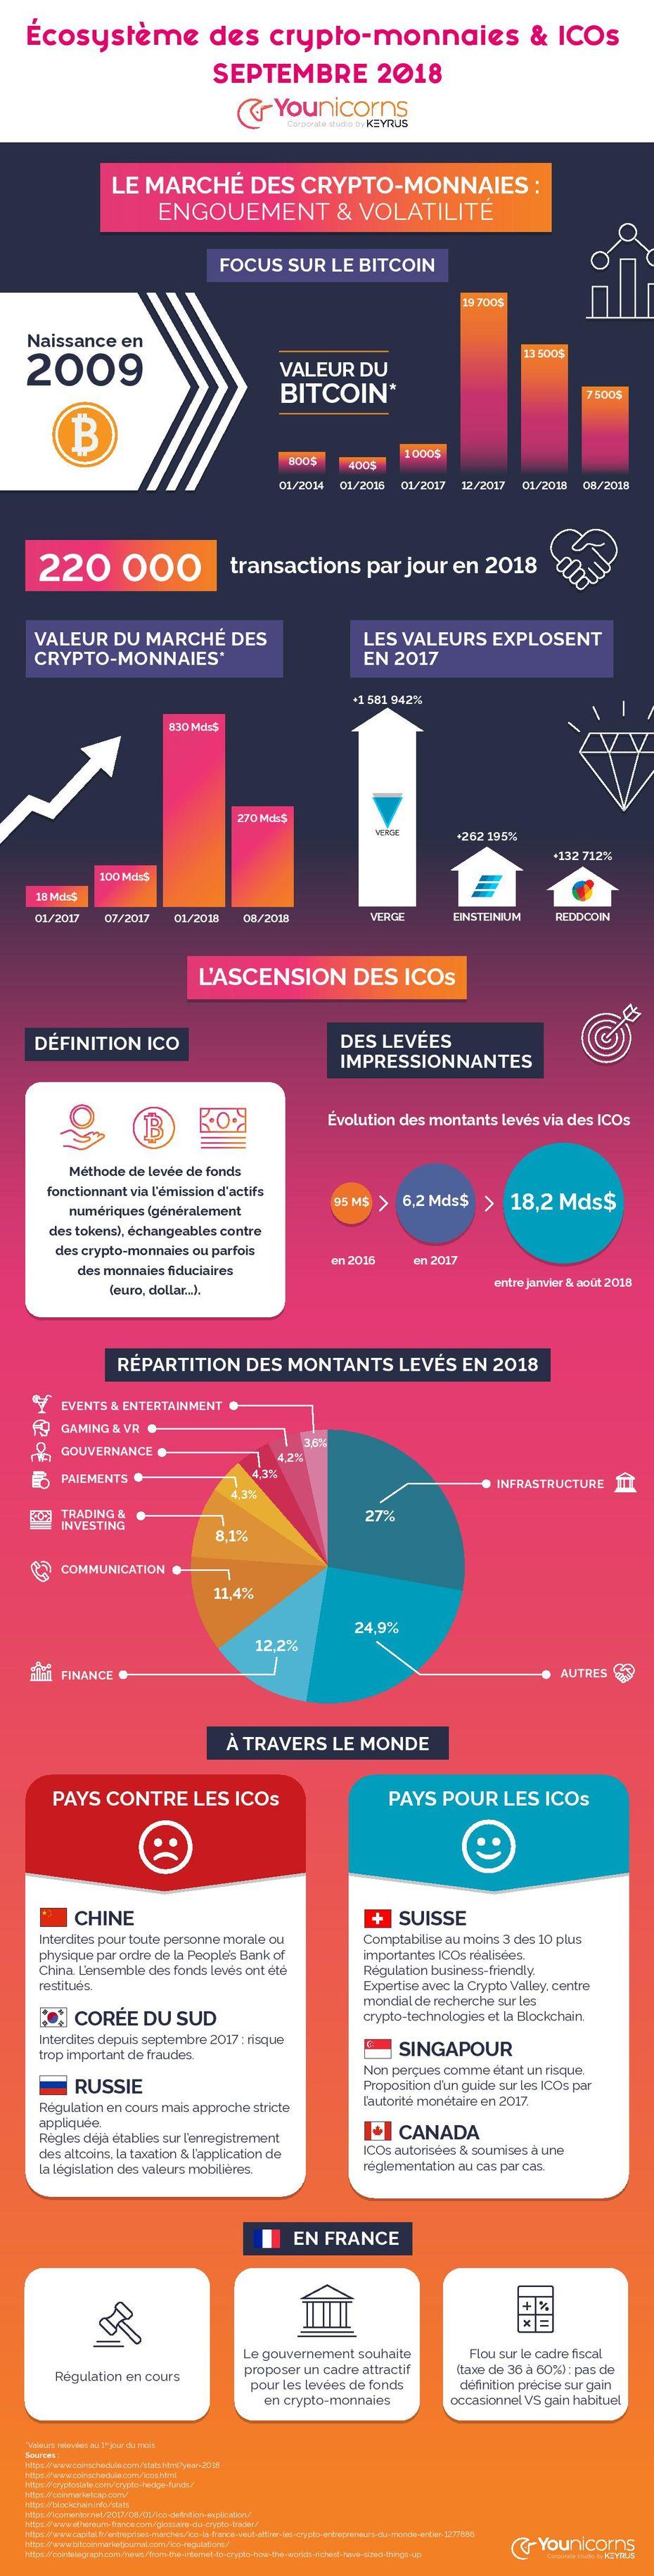 Infographie cryptomonnaies